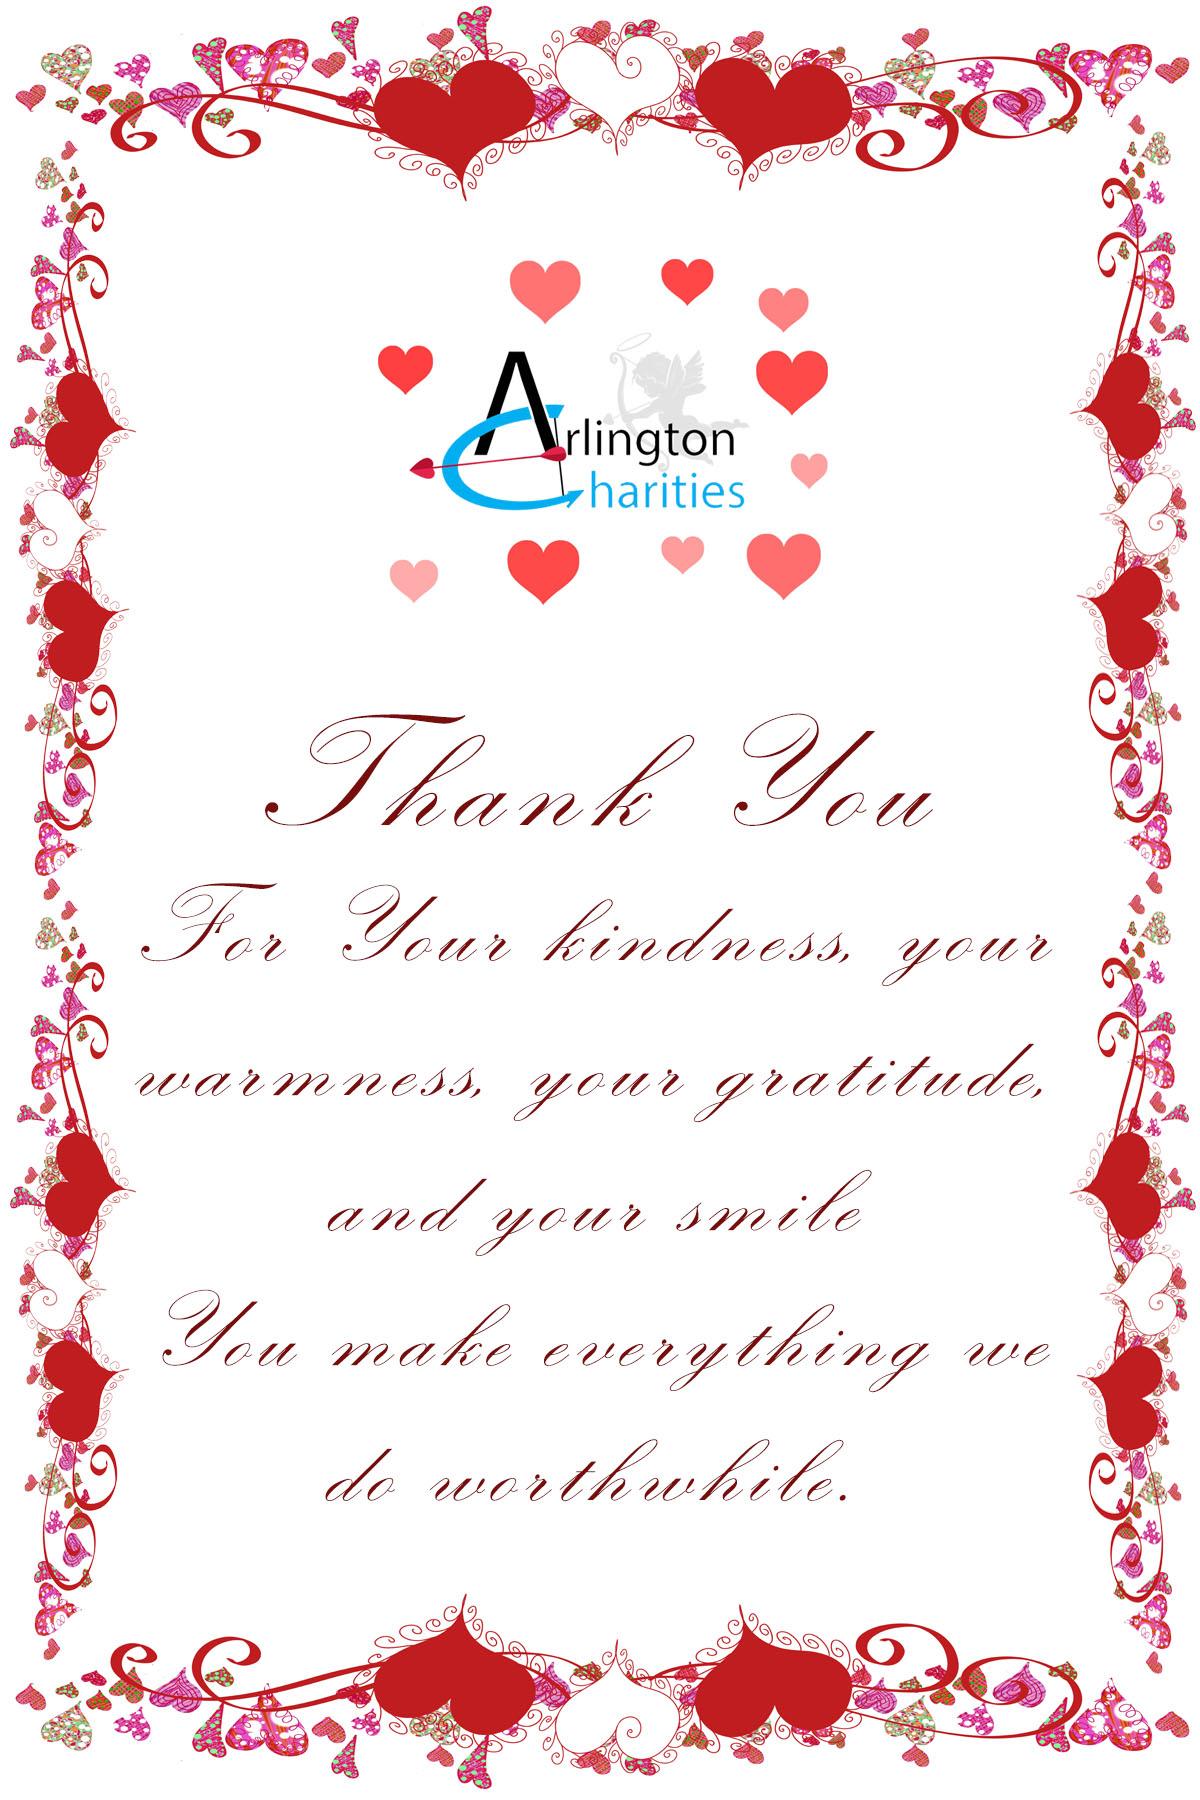 Arlington Charities Valentine 1